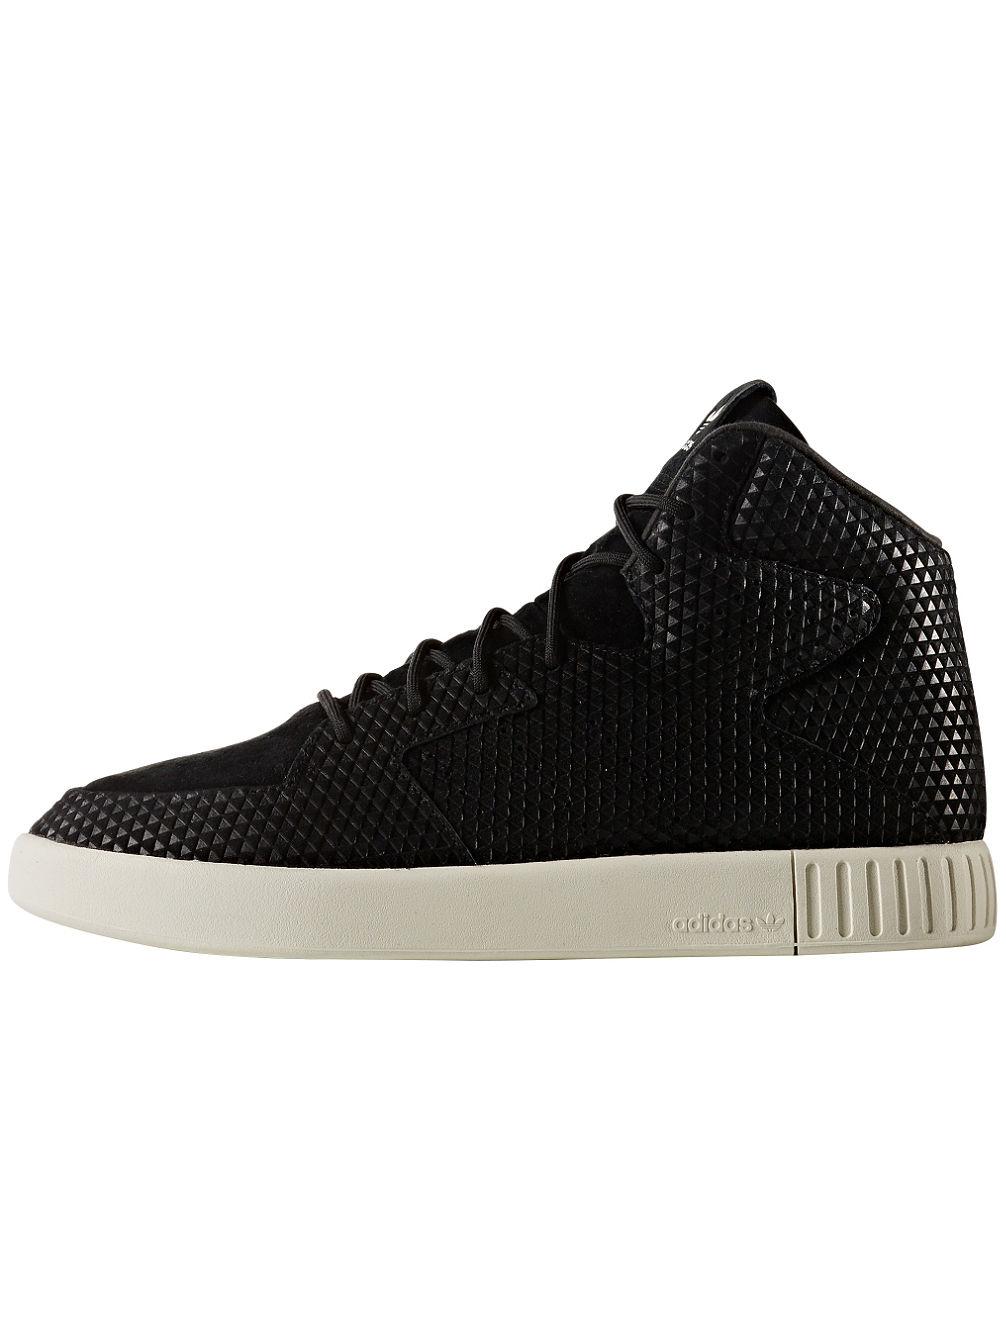 adidas-originals-tubular-invader-20-sneakers